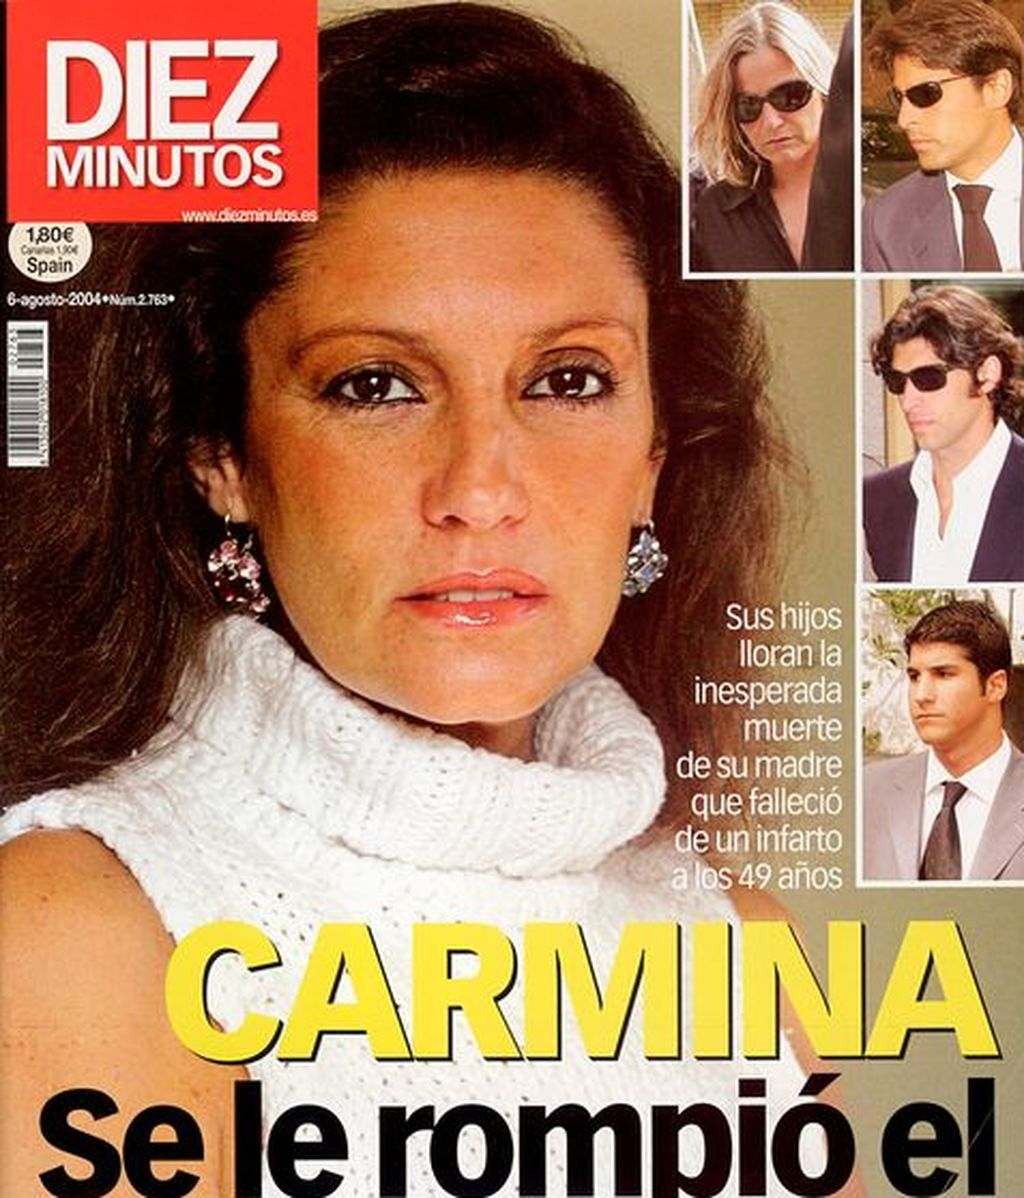 carmina-ordon-ez-portada-dm-1590503020